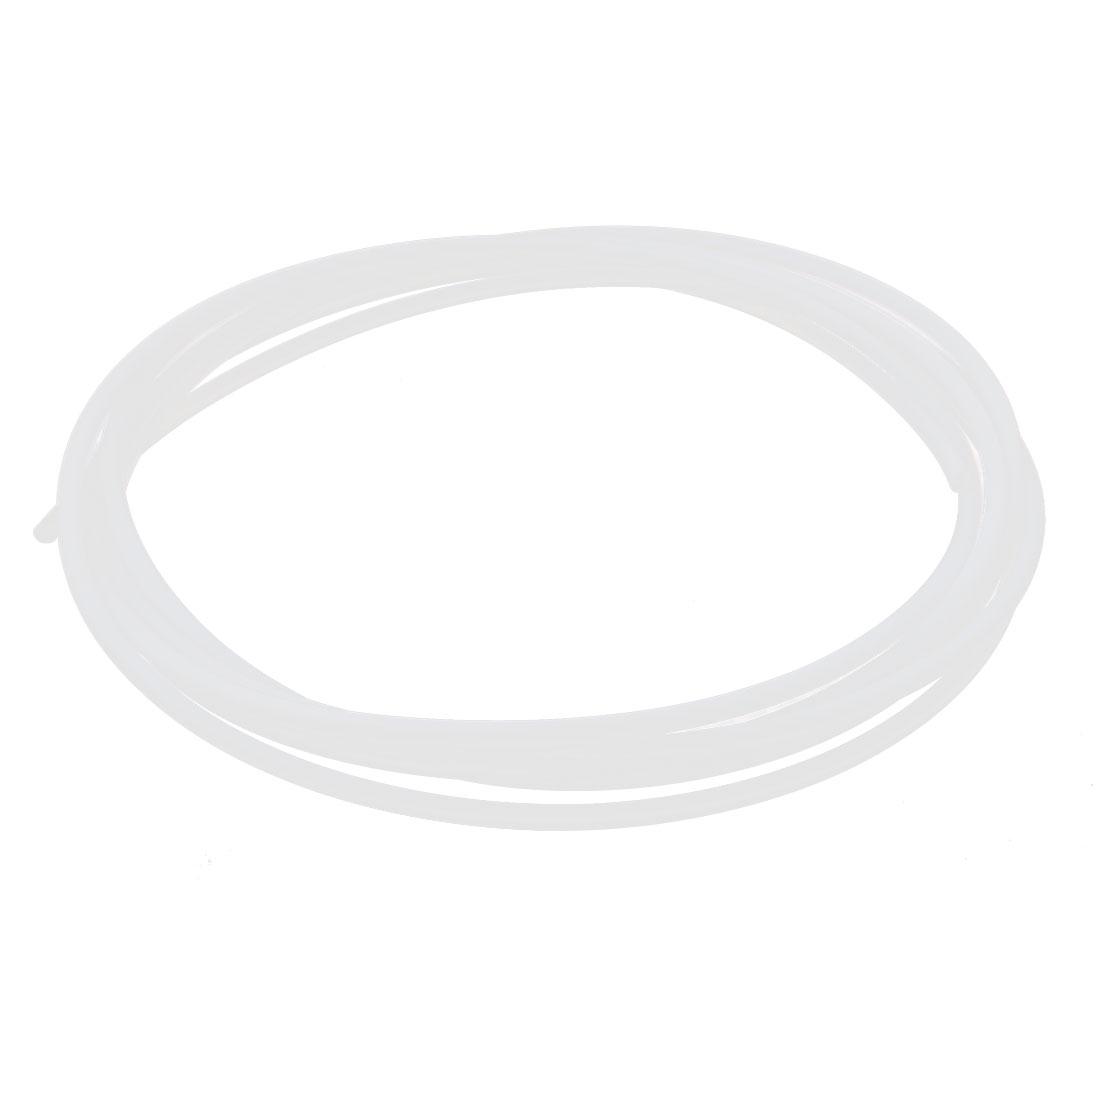 5M Length 6mm ID 8mm OD PTFE Tubing Tube Pipe for 3D Printer RepRap